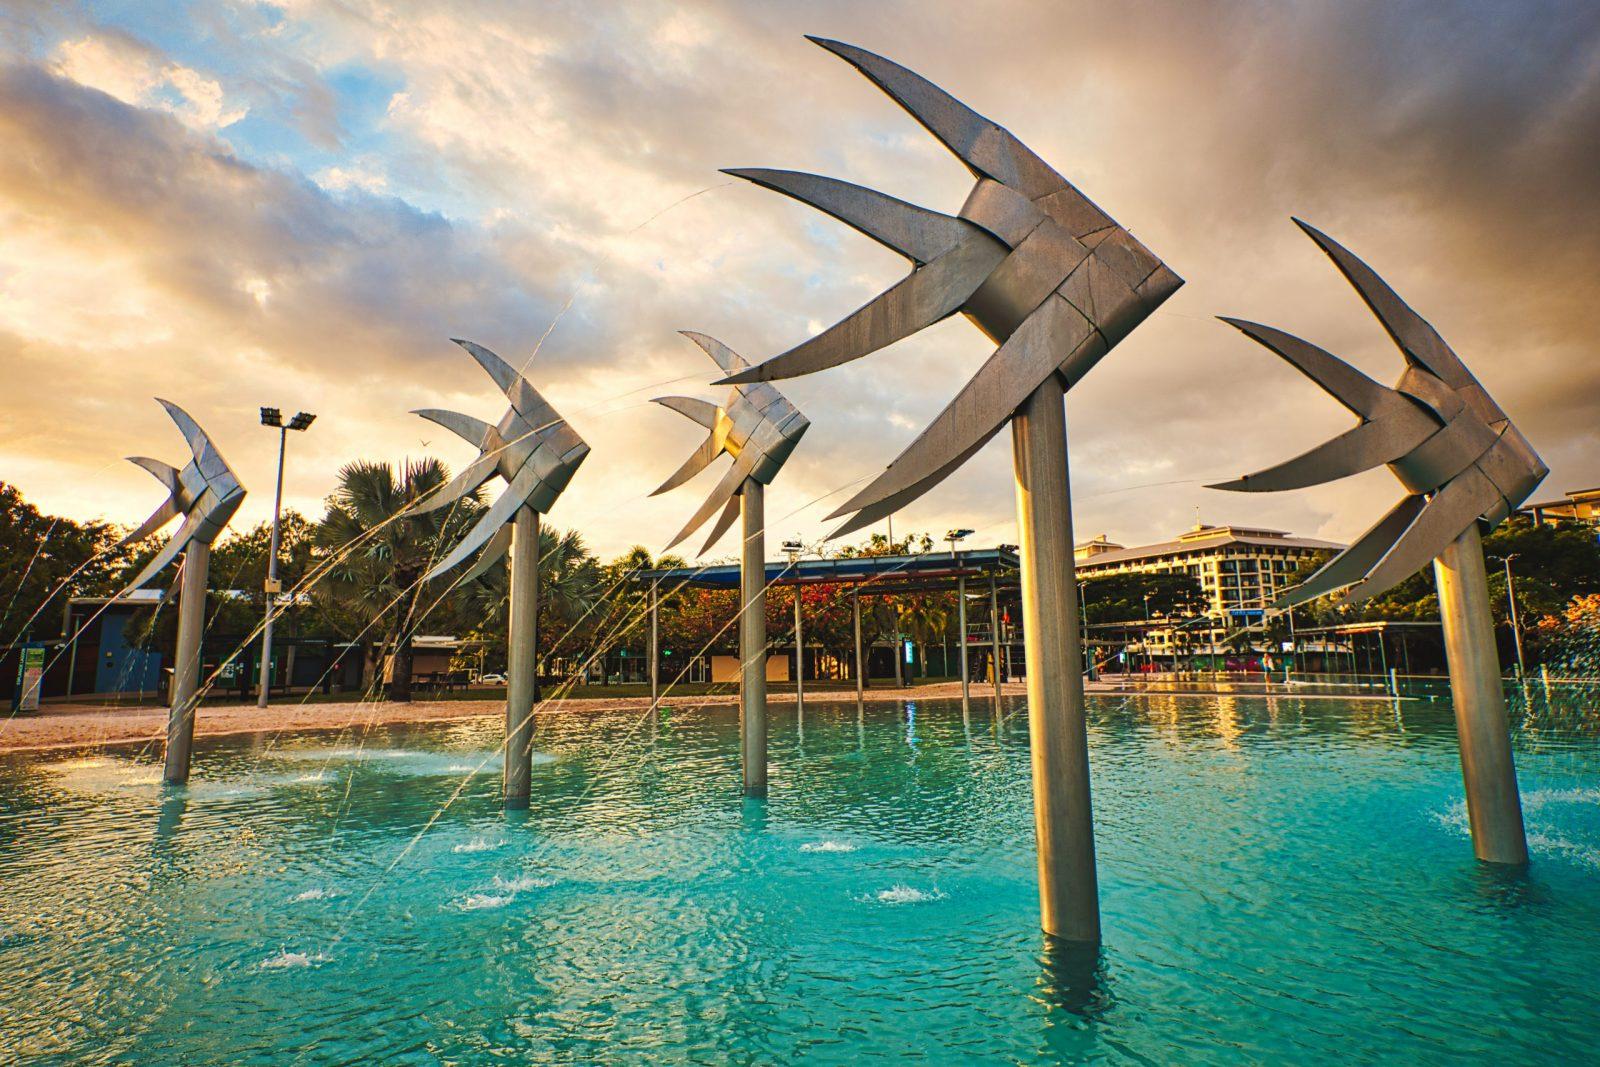 Sunrise at Cairns' Iconic Esplanade Lagoon.